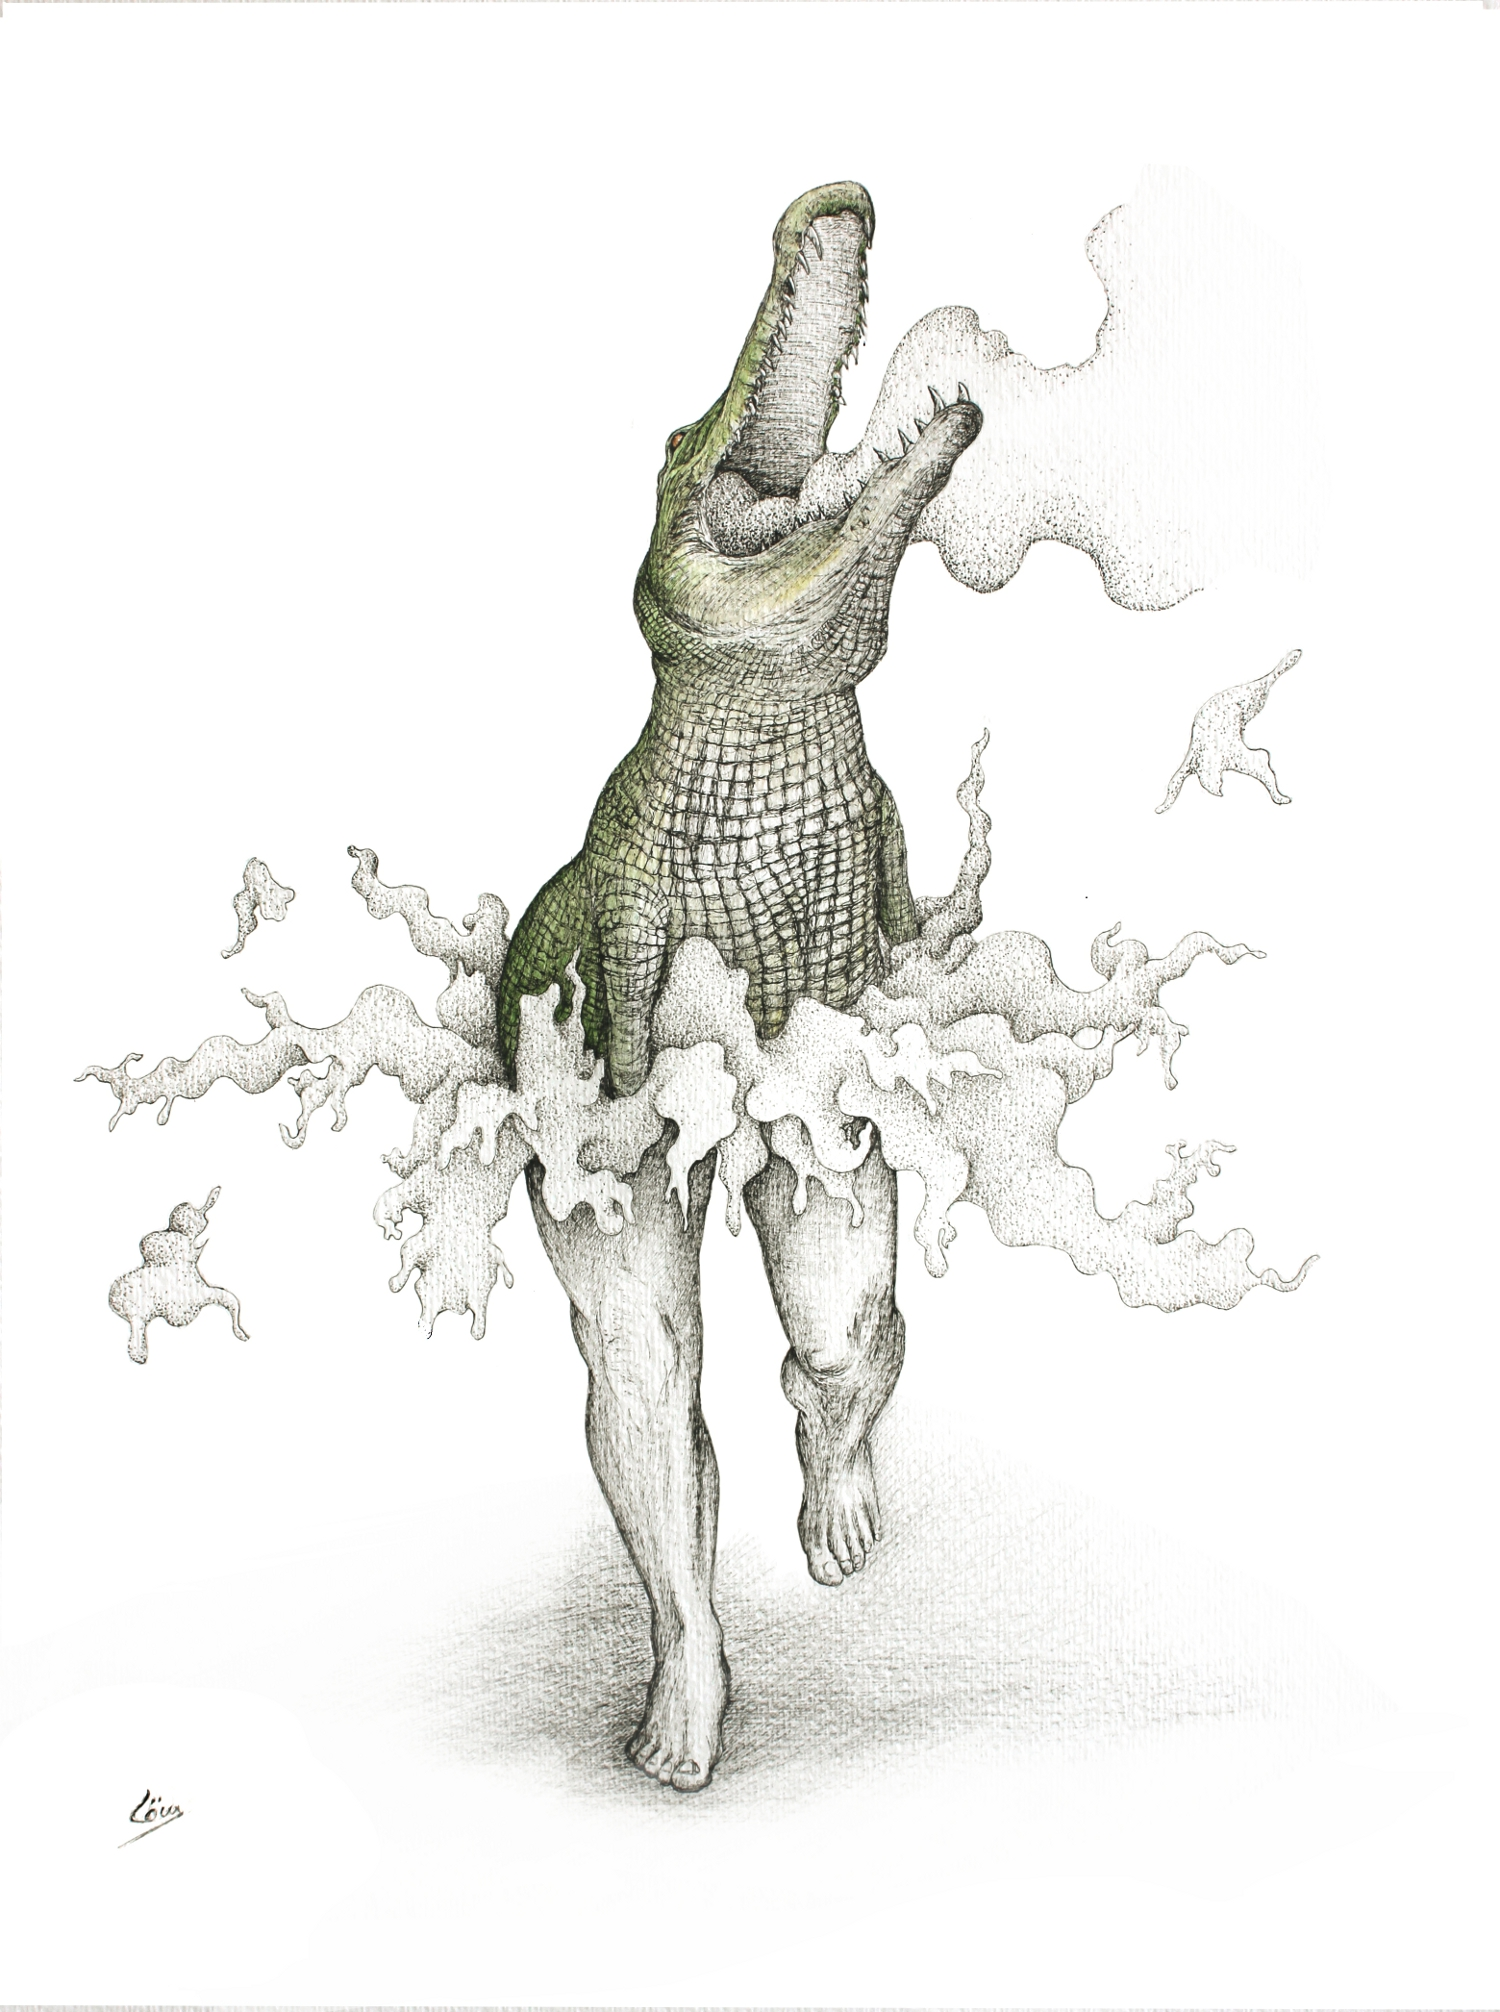 danseuse-etoile-36-x-48-cm-styloaqua-su-papier